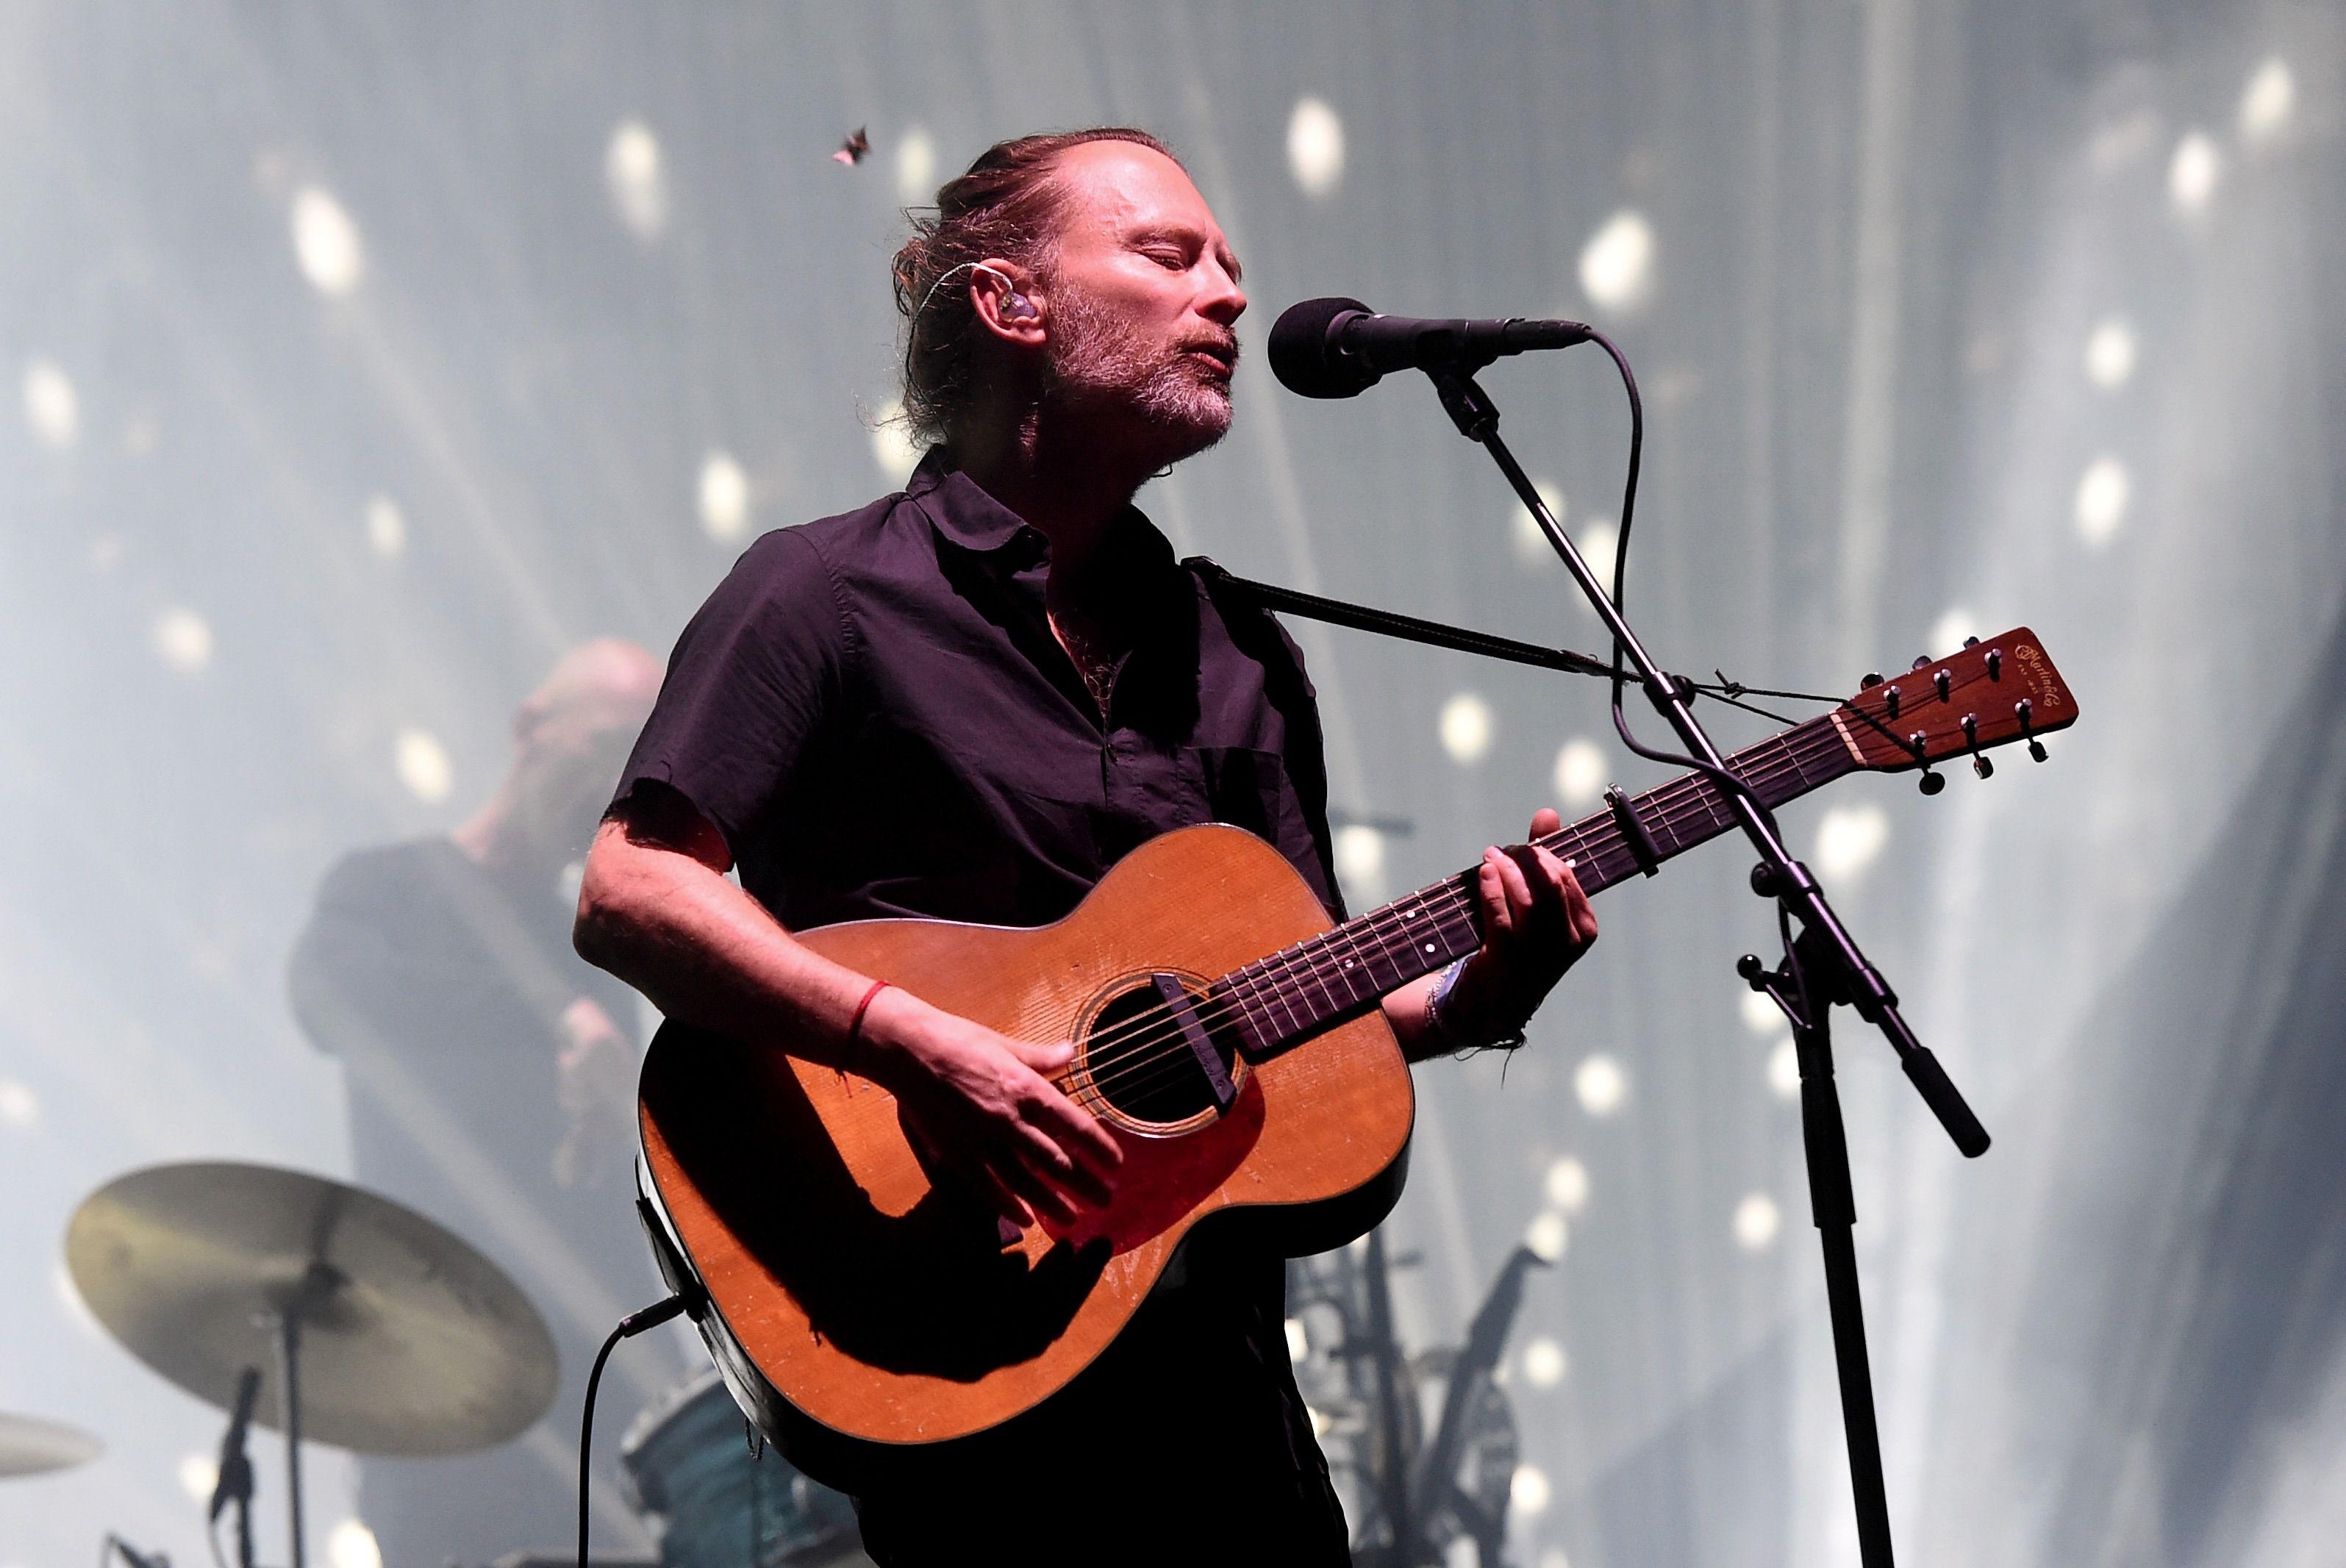 Radiohead frontman Thom Yorke at the Coachella music festival in April.